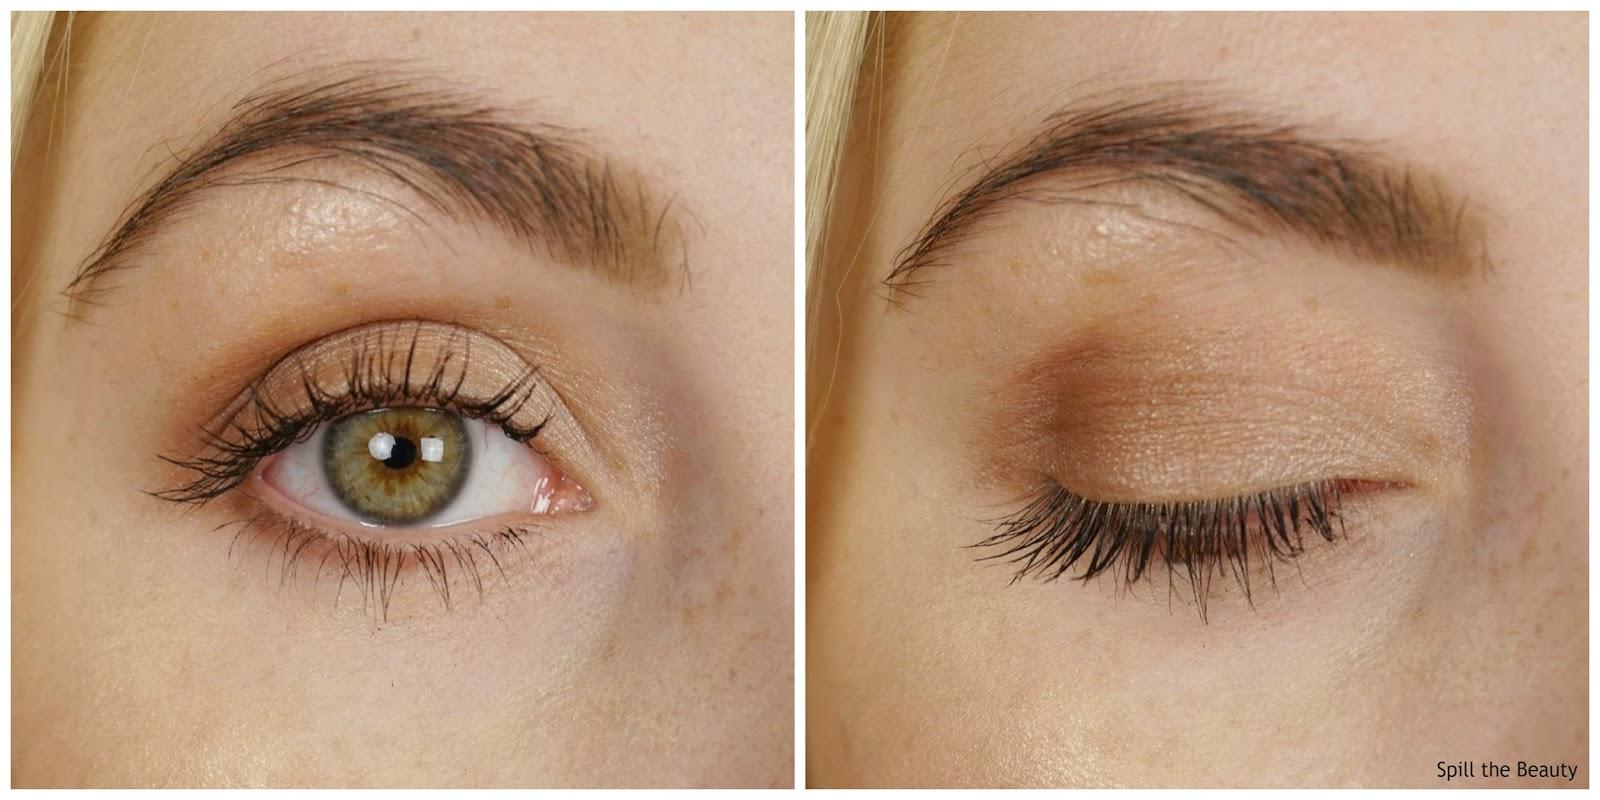 MAC Nutcracker Sweet Smoky Eye Compact eye shadow x 9 review swatches look